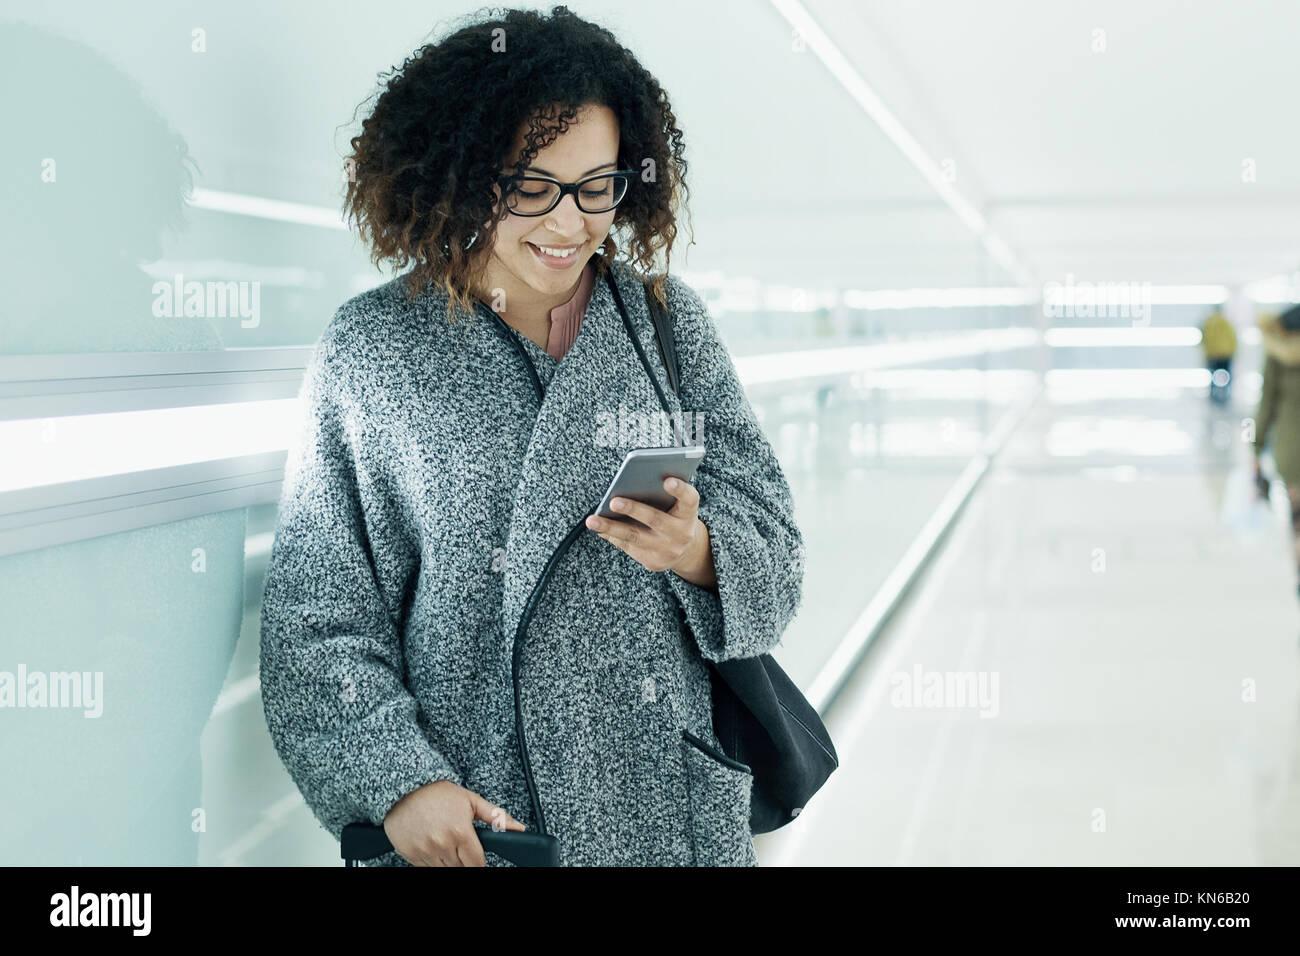 Afro American girl texting et à l'aide d'un smartphone Photo Stock